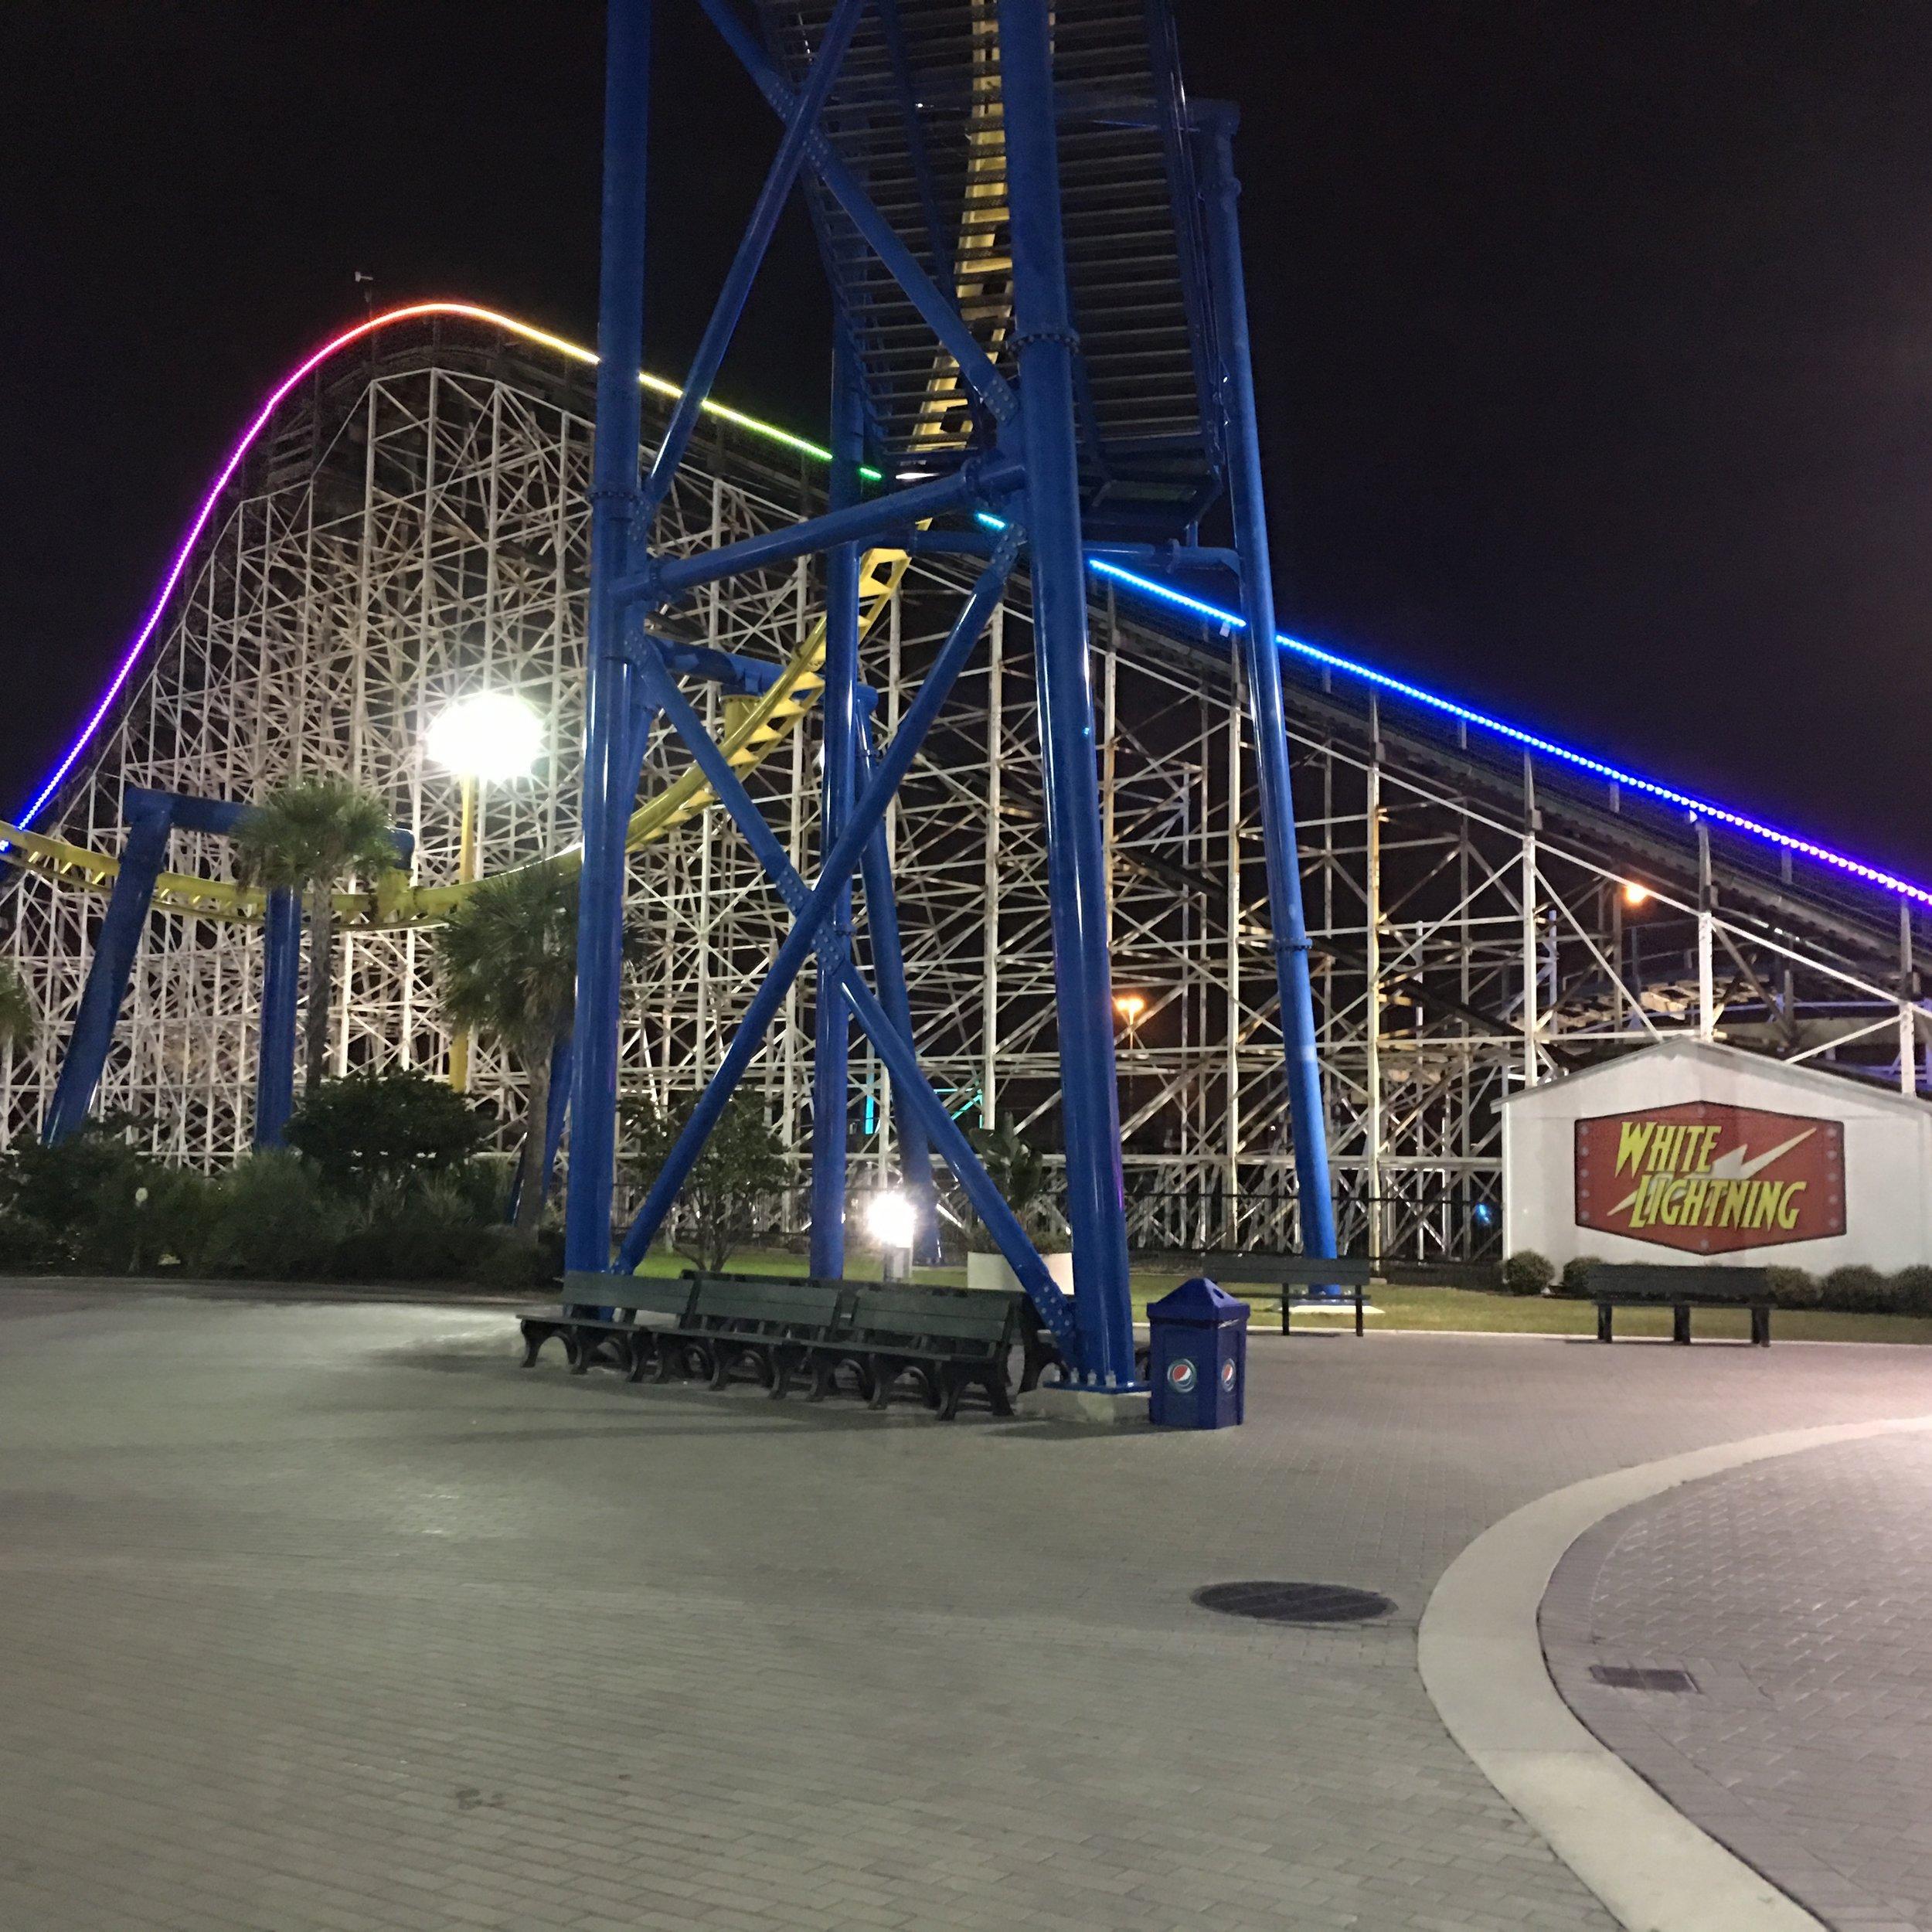 White Lightning at Fun Spot America